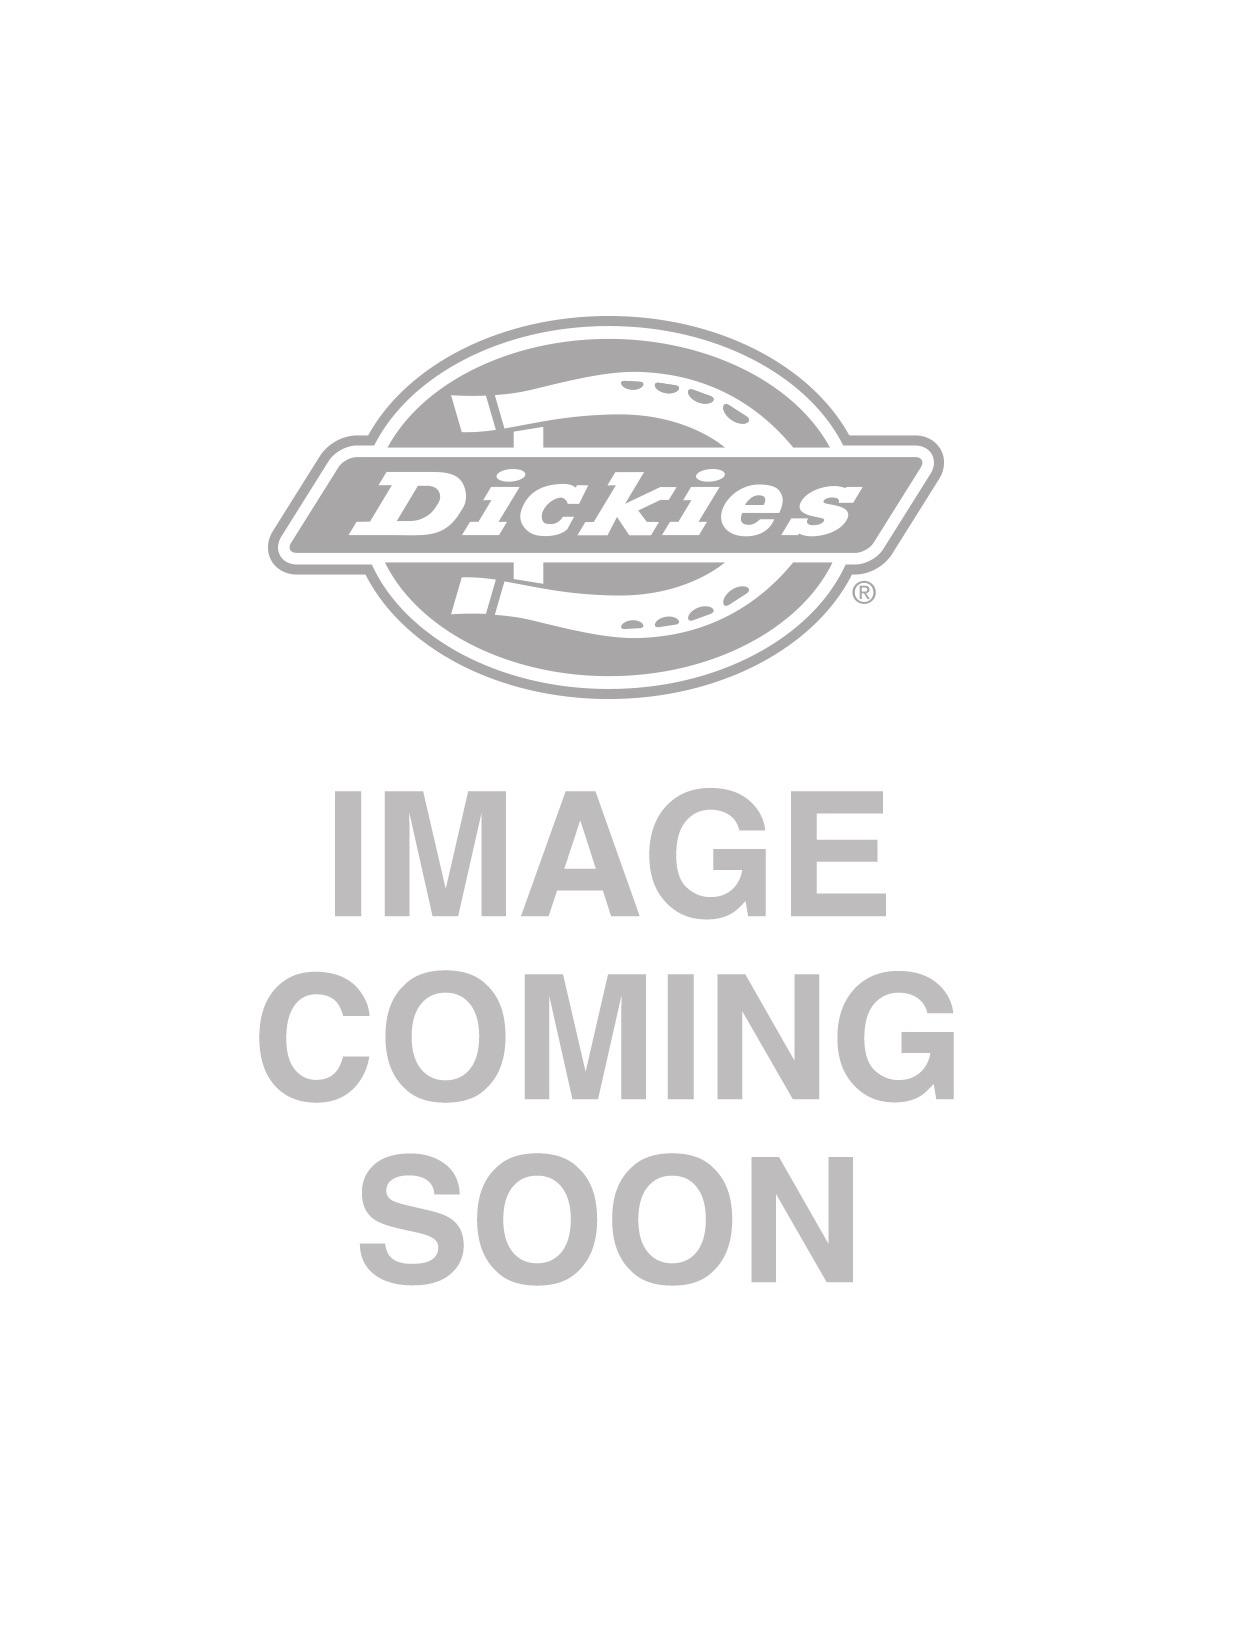 Dickies Tiptonville T-Shirt